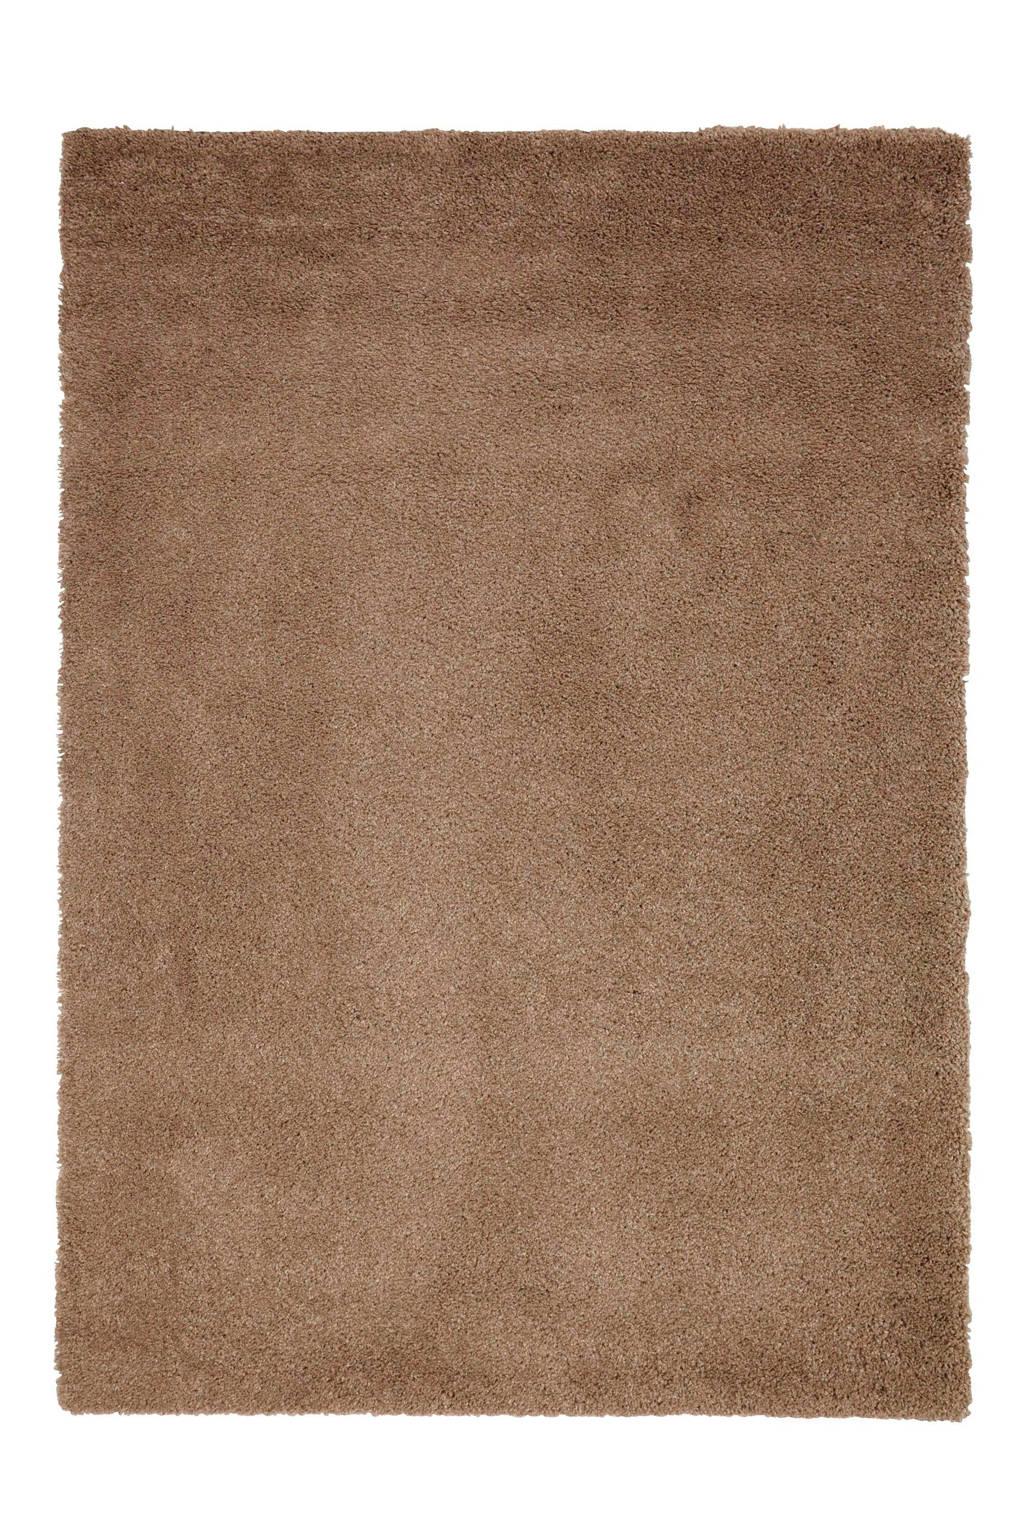 whkmp's own Vloerkleed  (230x160 cm), Taupe